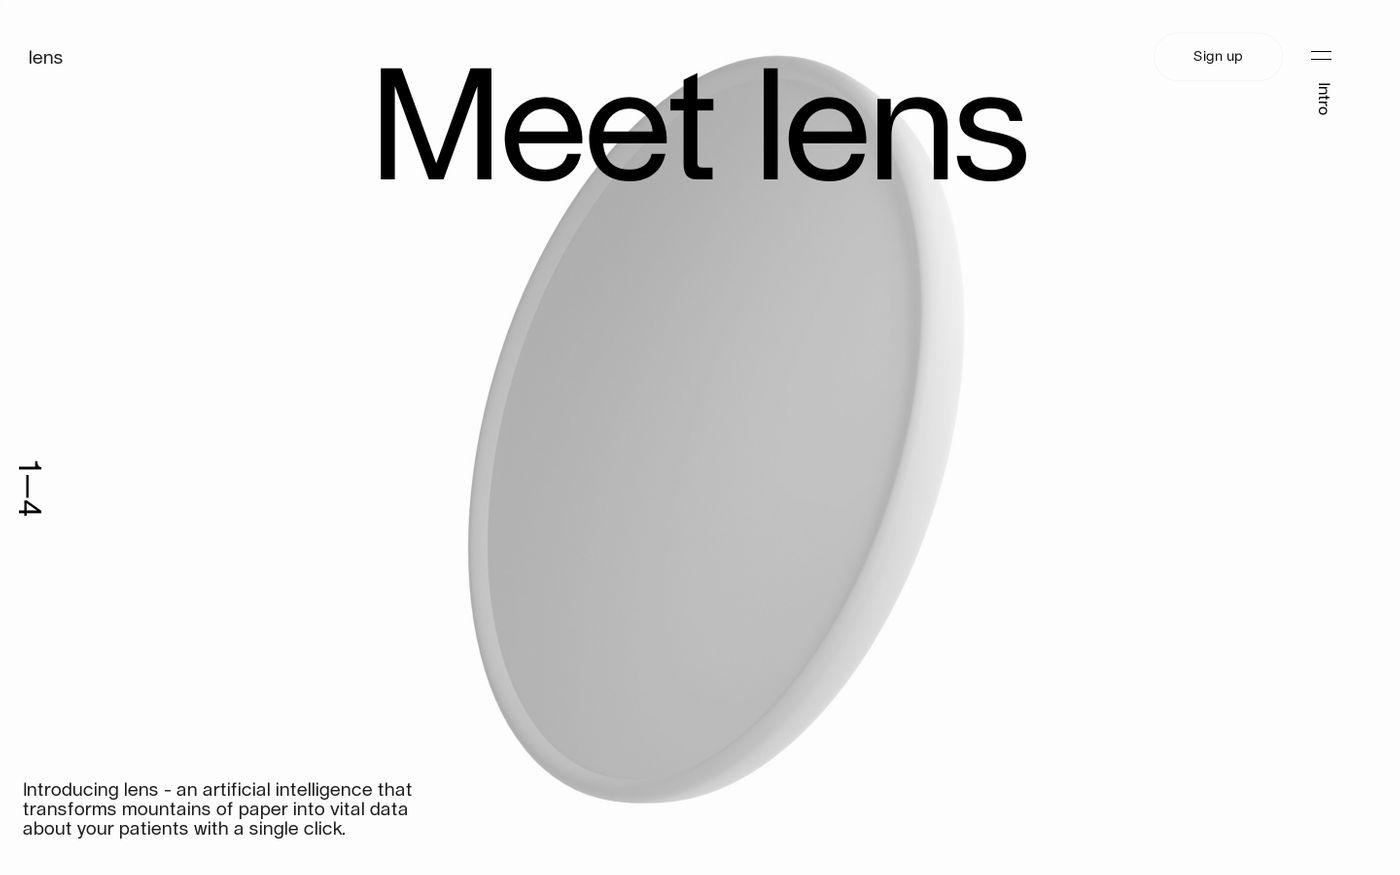 Screenshot of Lens by Science website